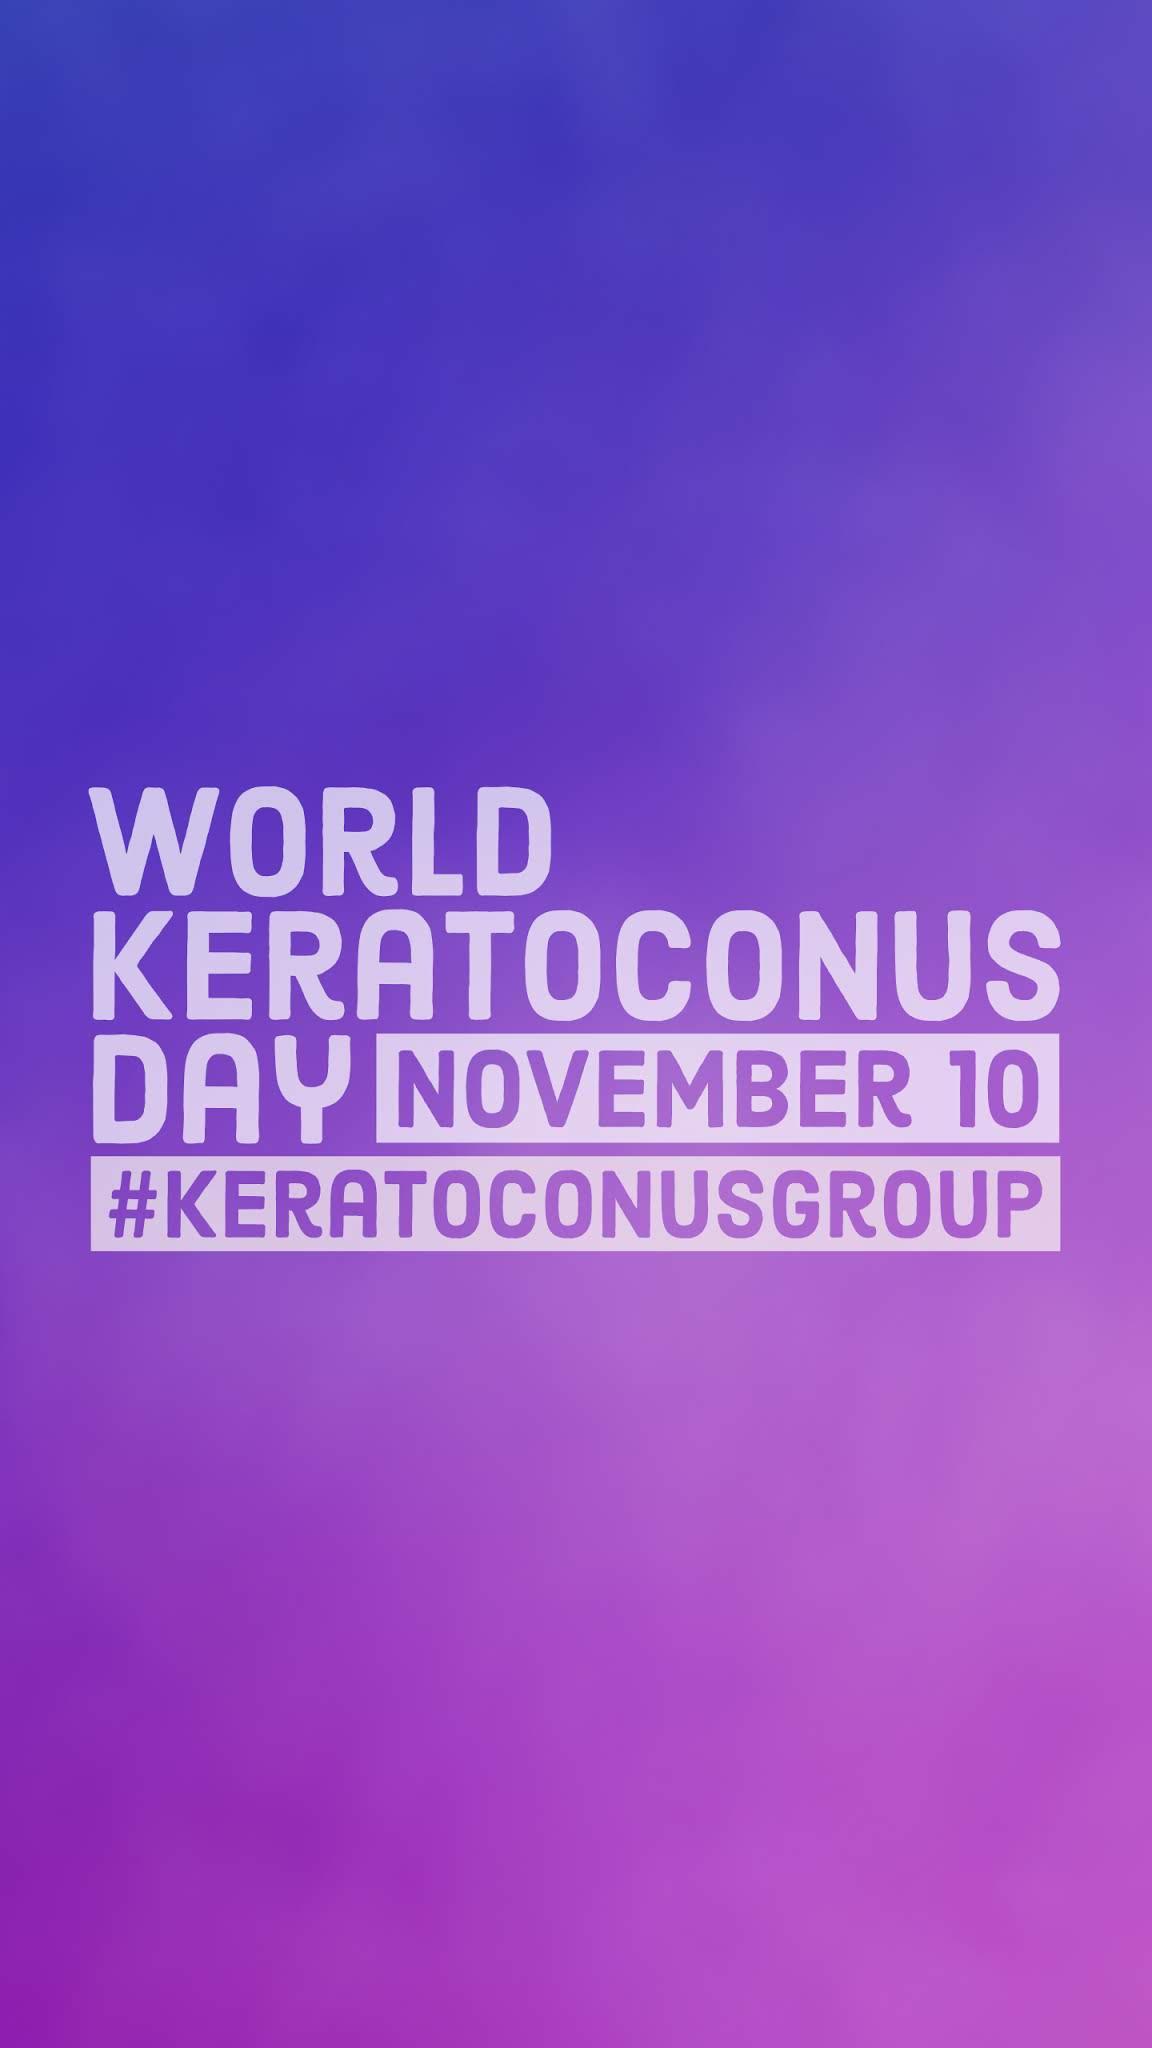 National Keratoconus Day 2018 Mobile Wallpaper